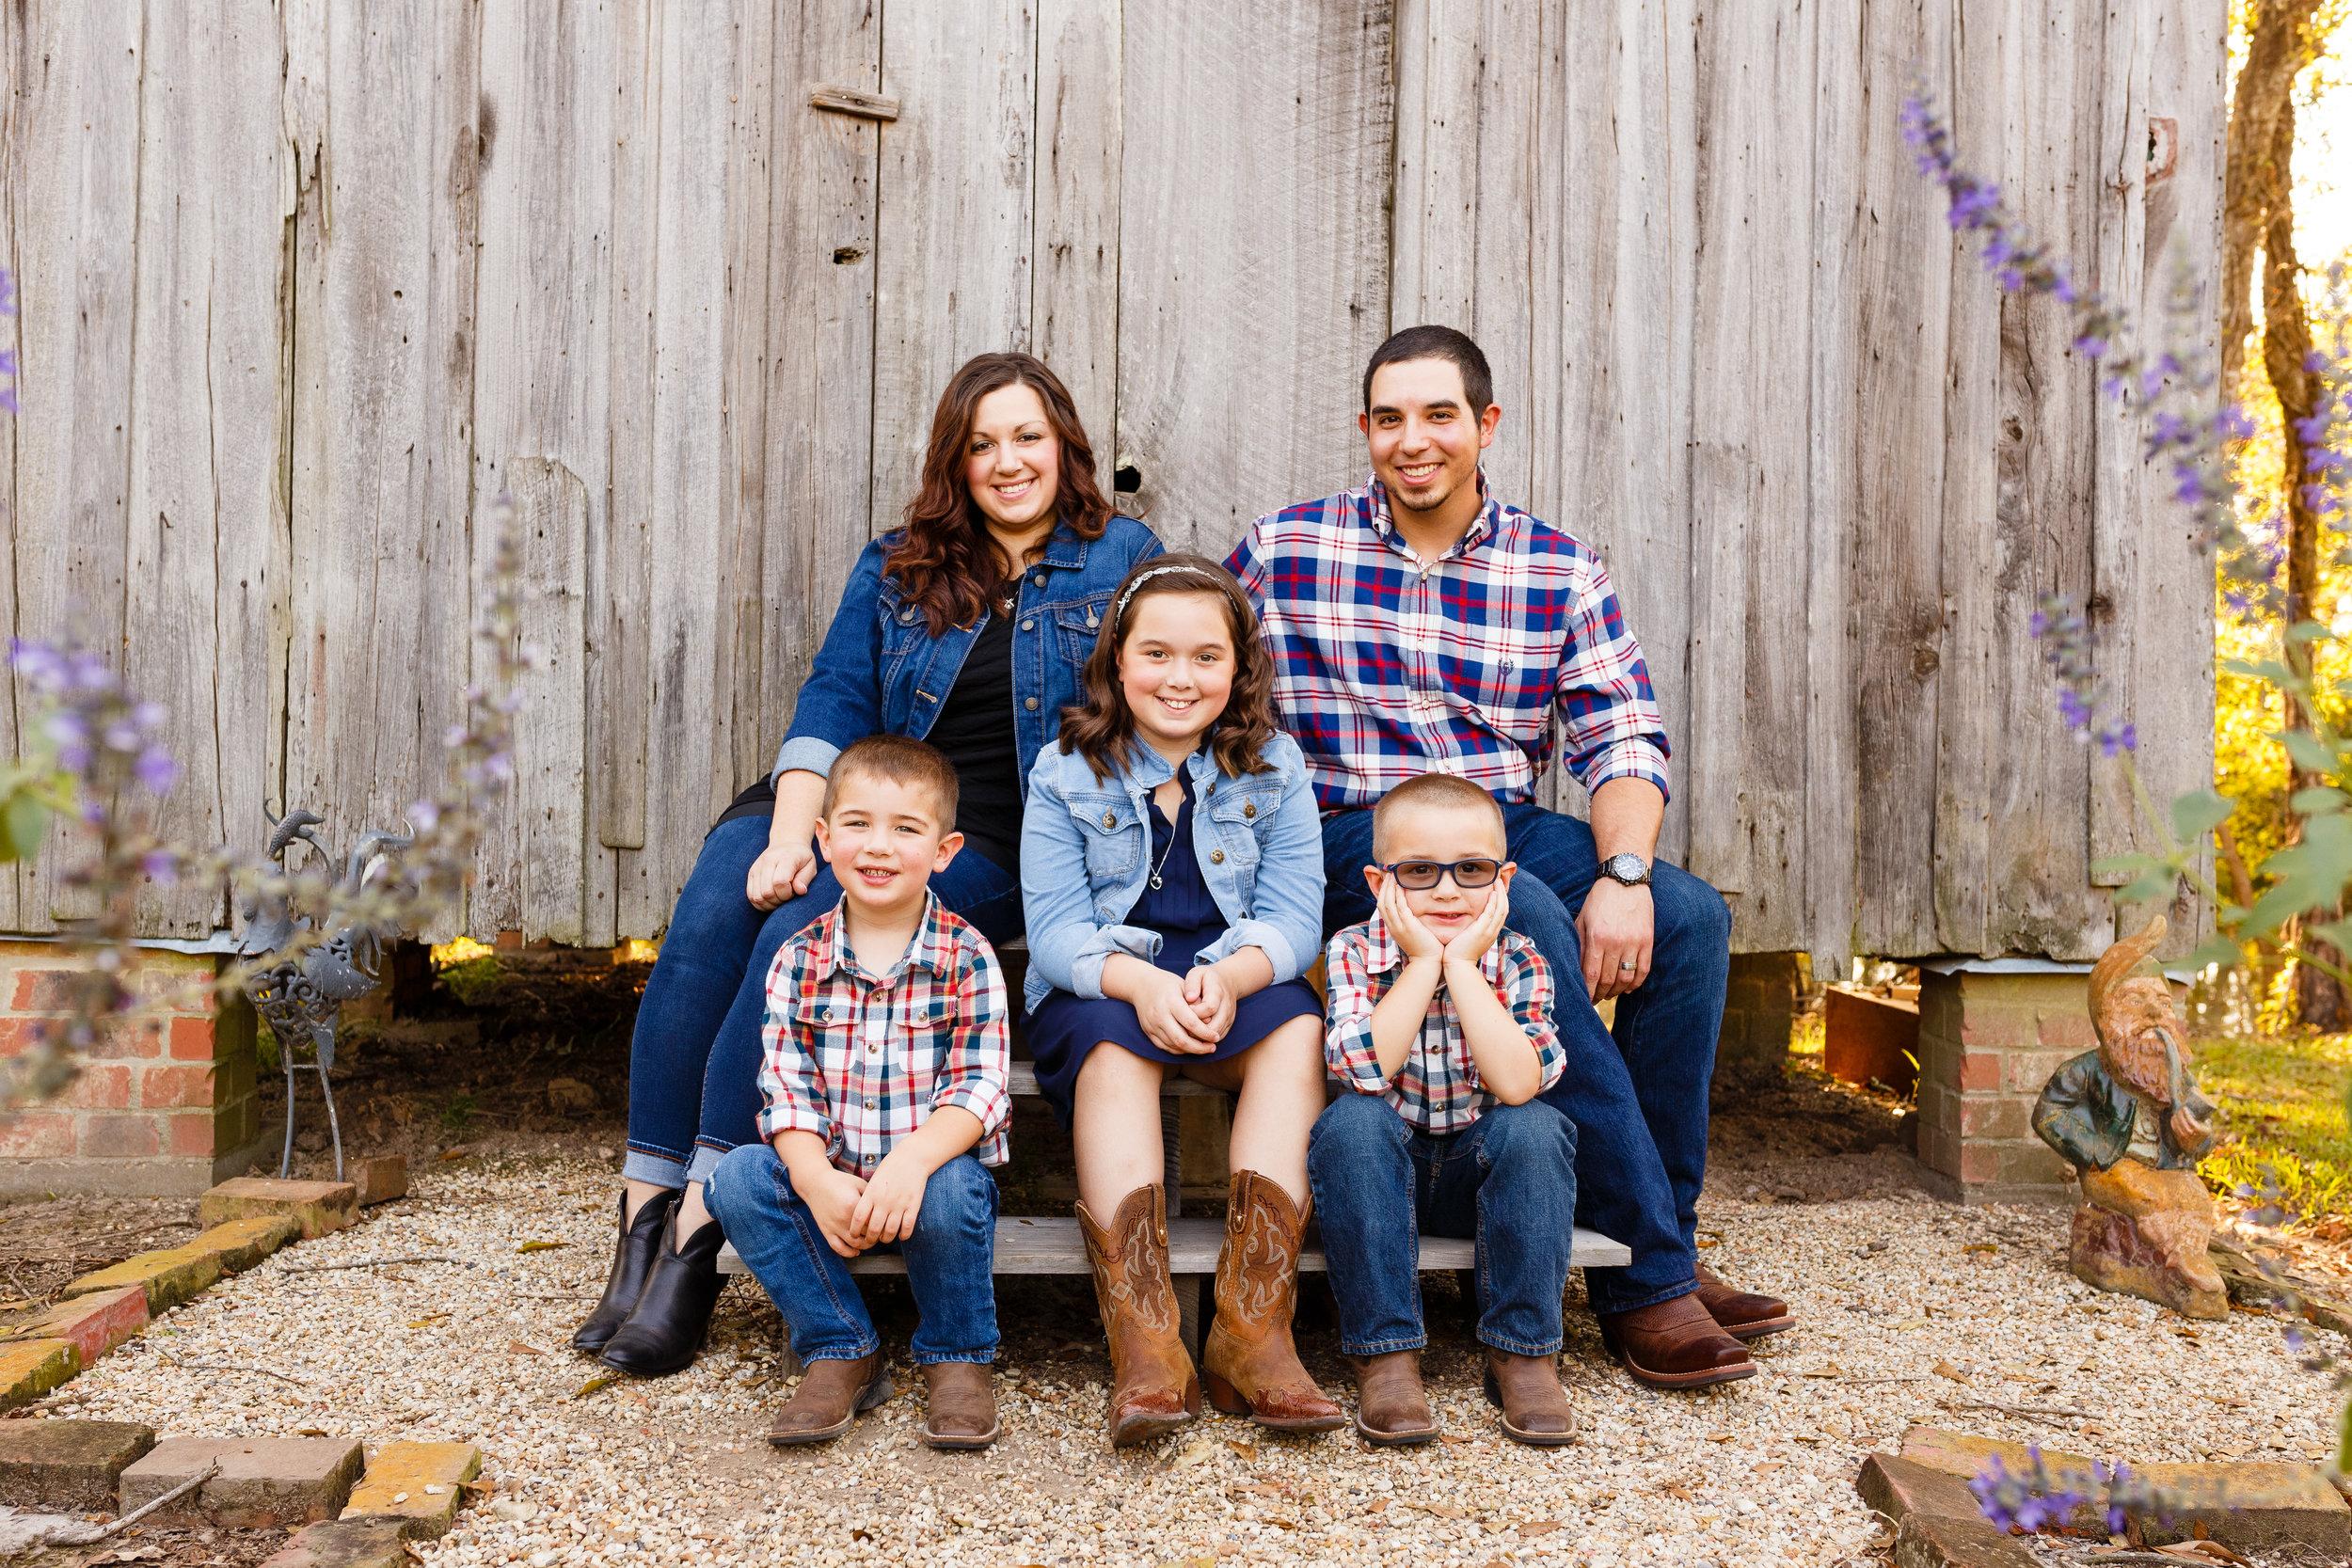 Family-child-portrait-lafayette-broussard-youngsville-photographer-3.jpg